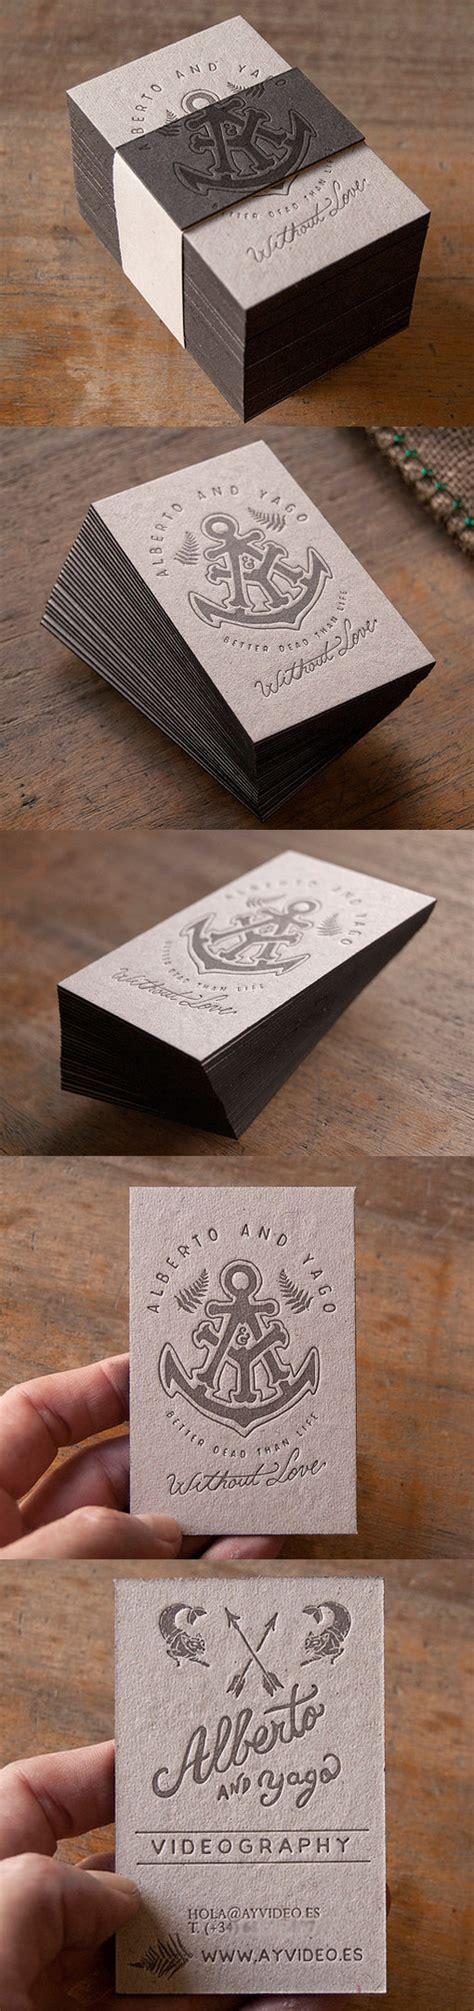 card set earthy vintage styled letterpress business card set for a